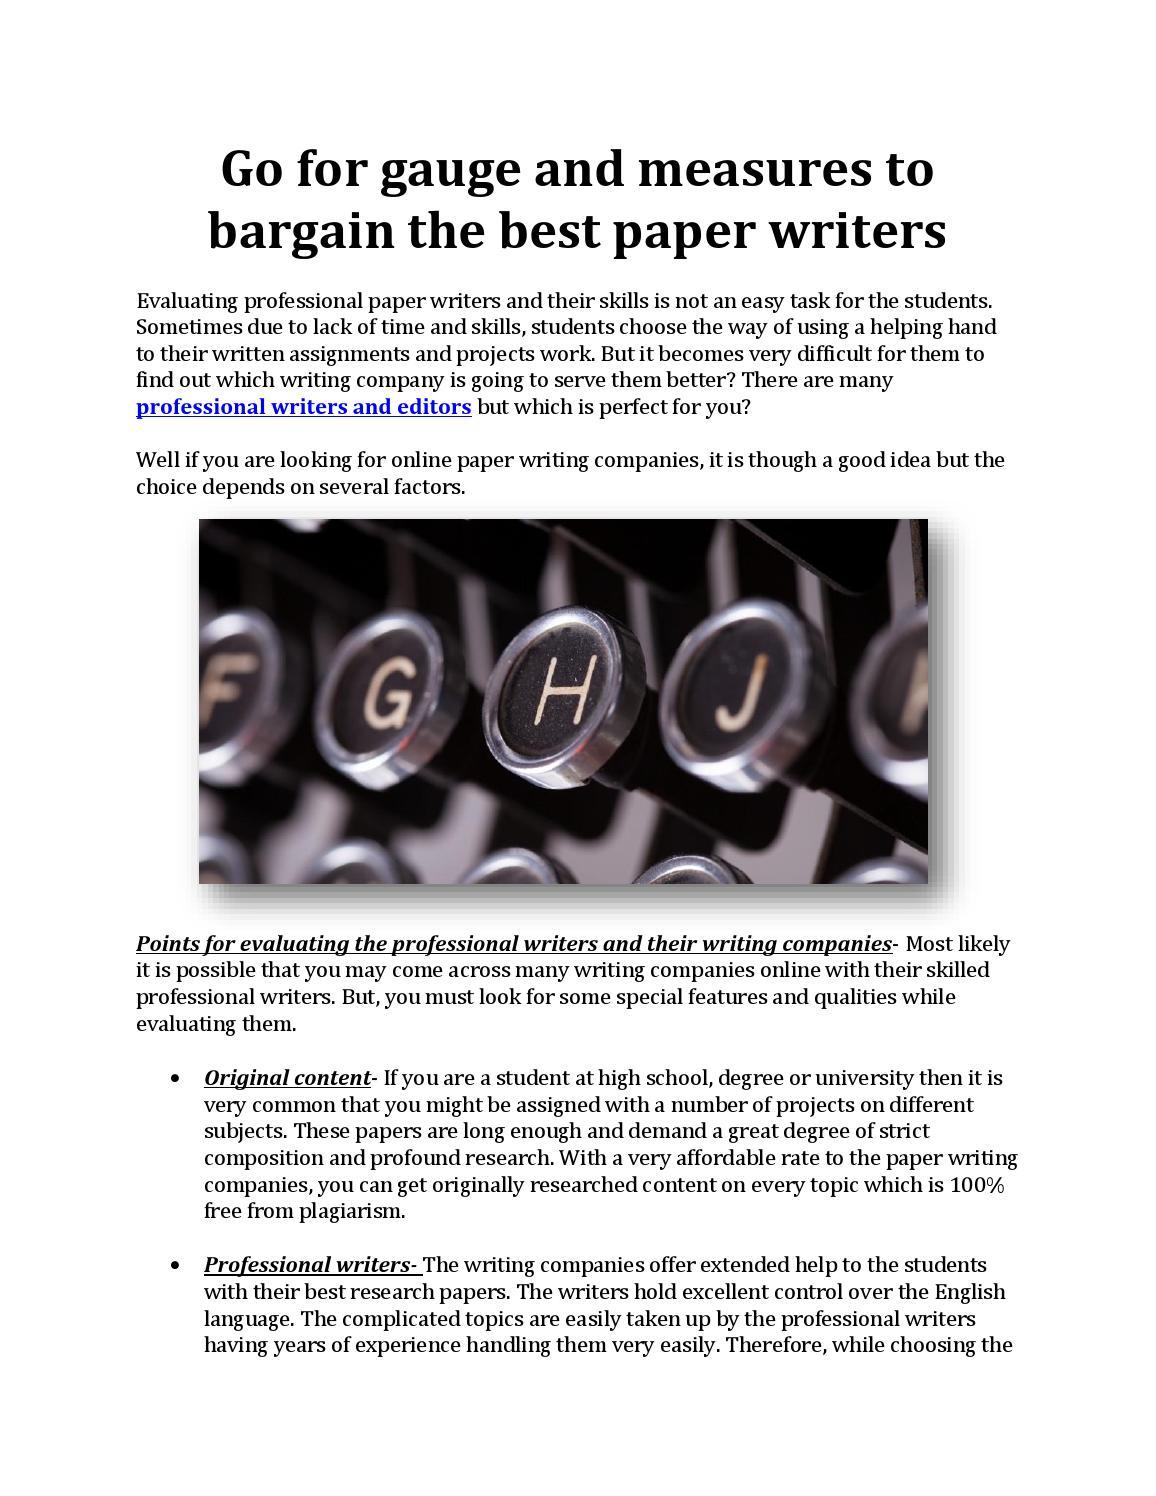 the writers company